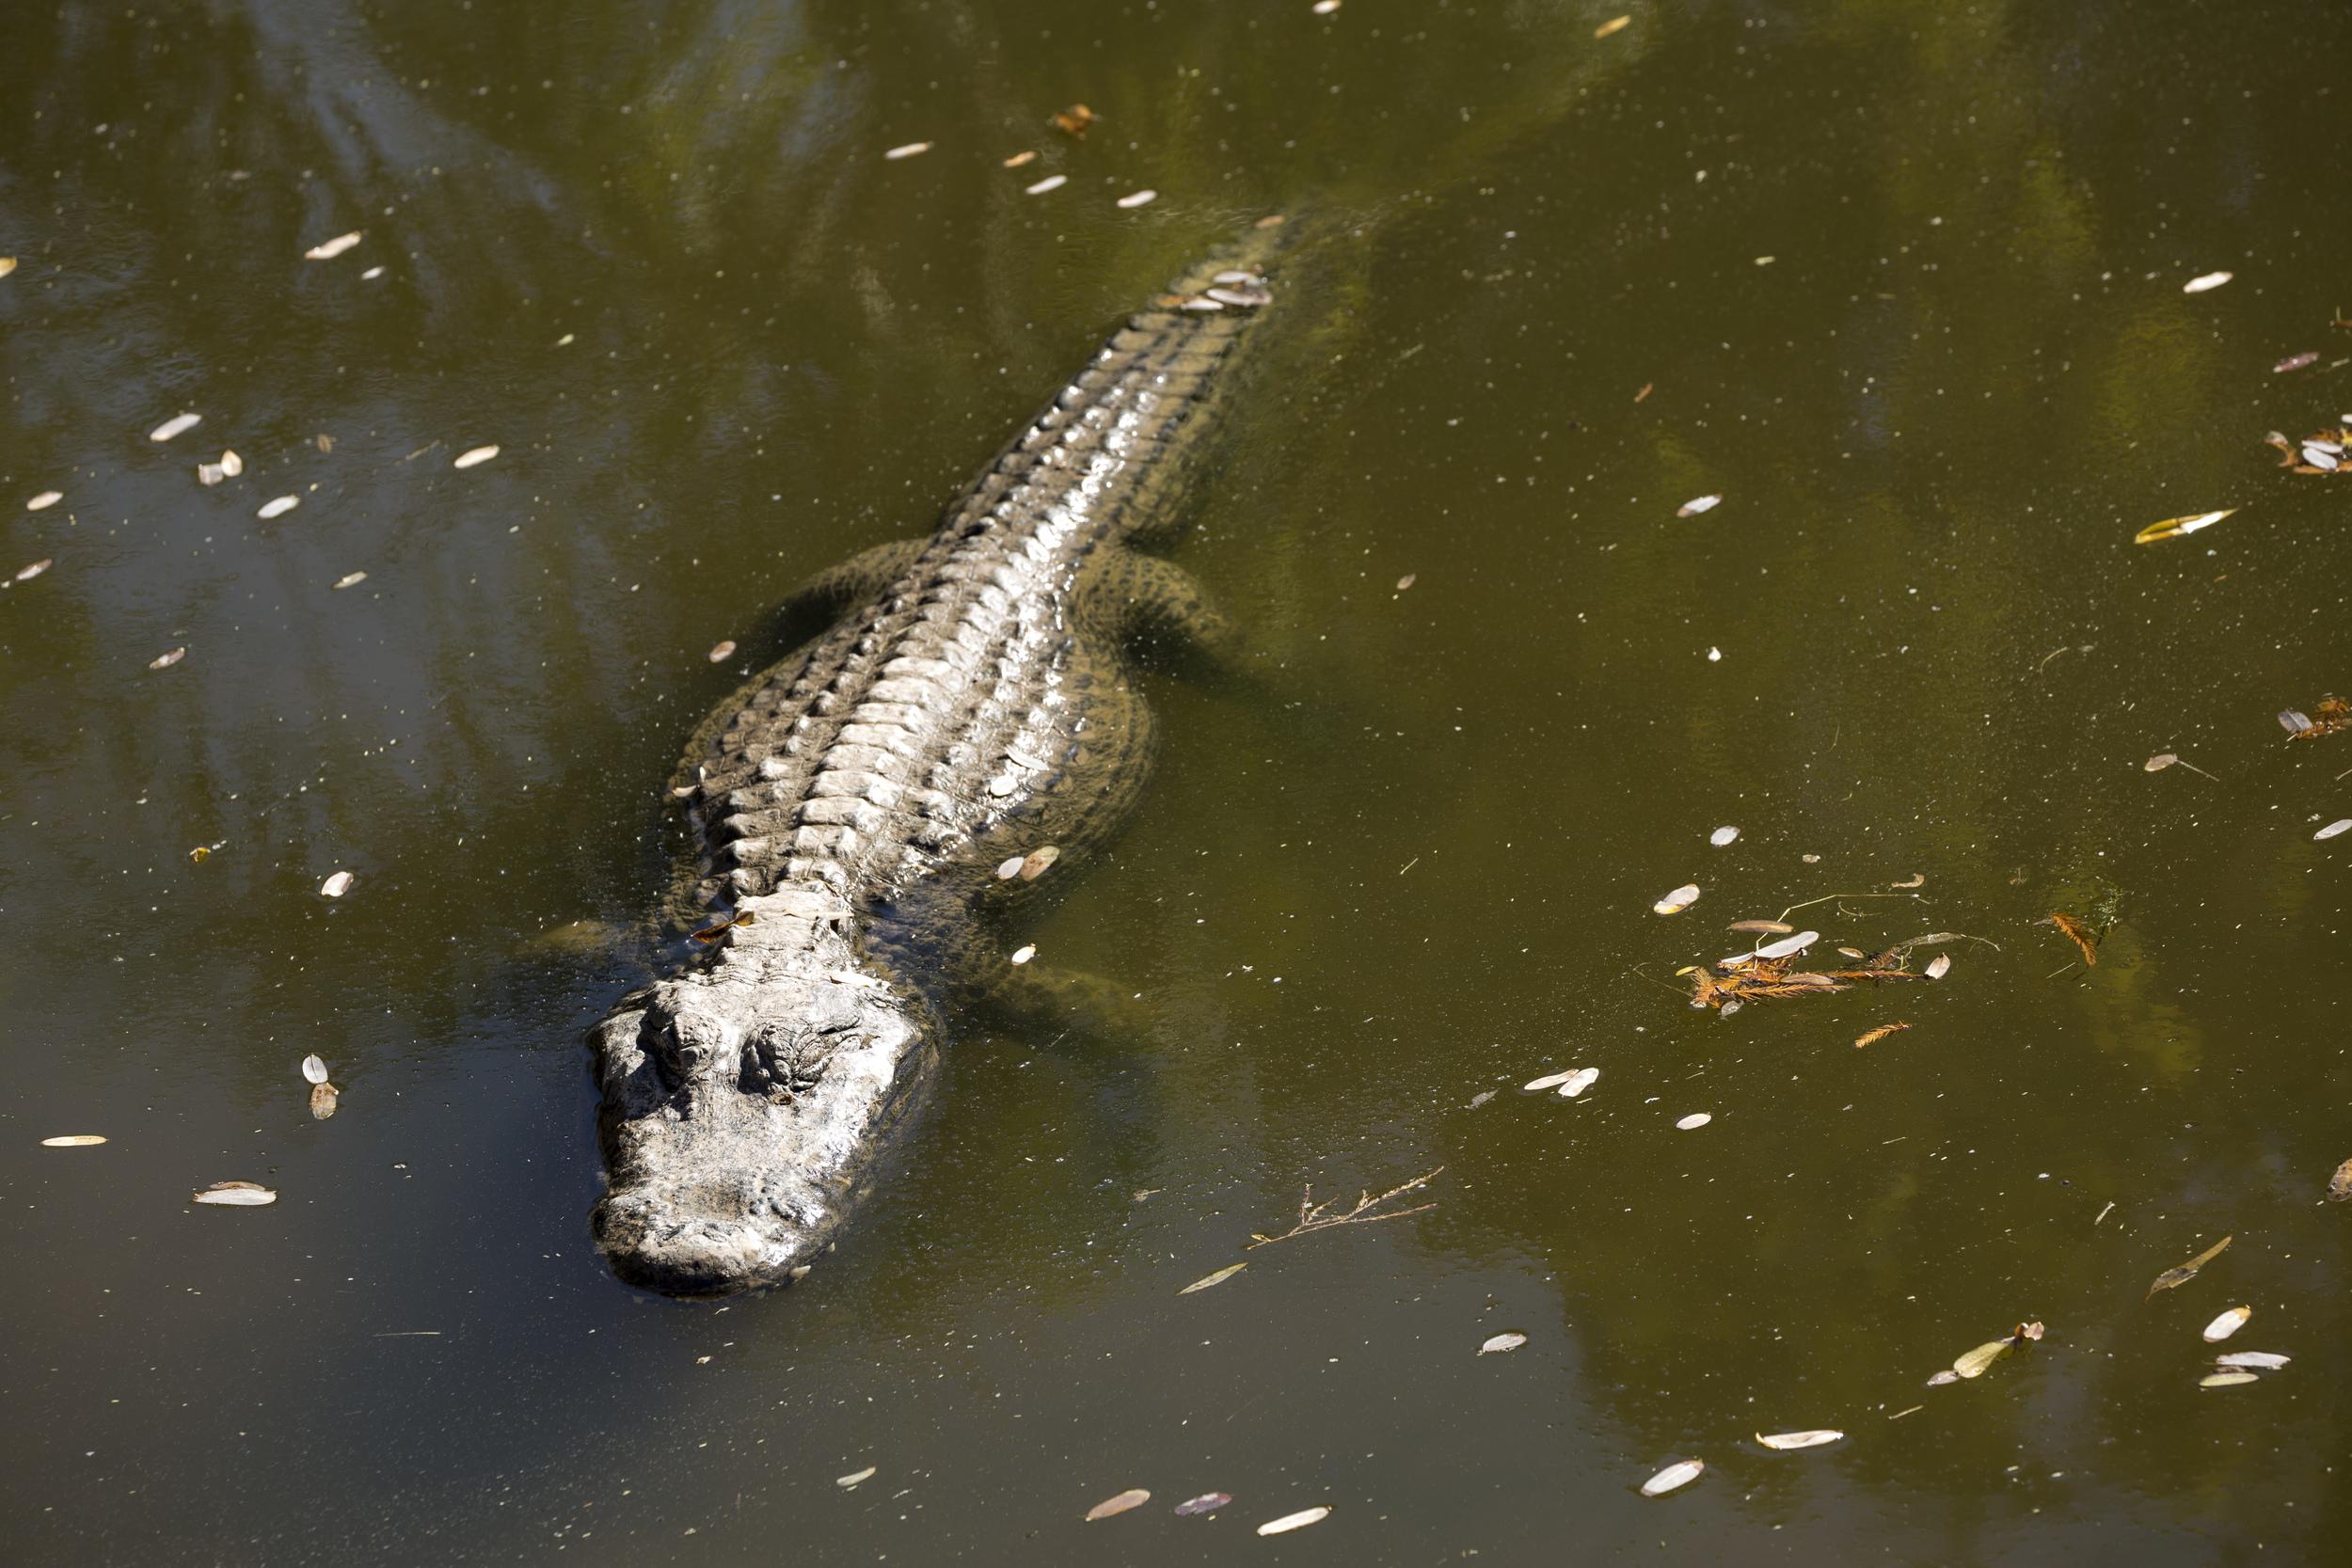 Alligator Sunbathing @  The Phoenix Zoo | Canon 5D Mark III w/ 70-300L @ f/8 1/250 & 161  mm